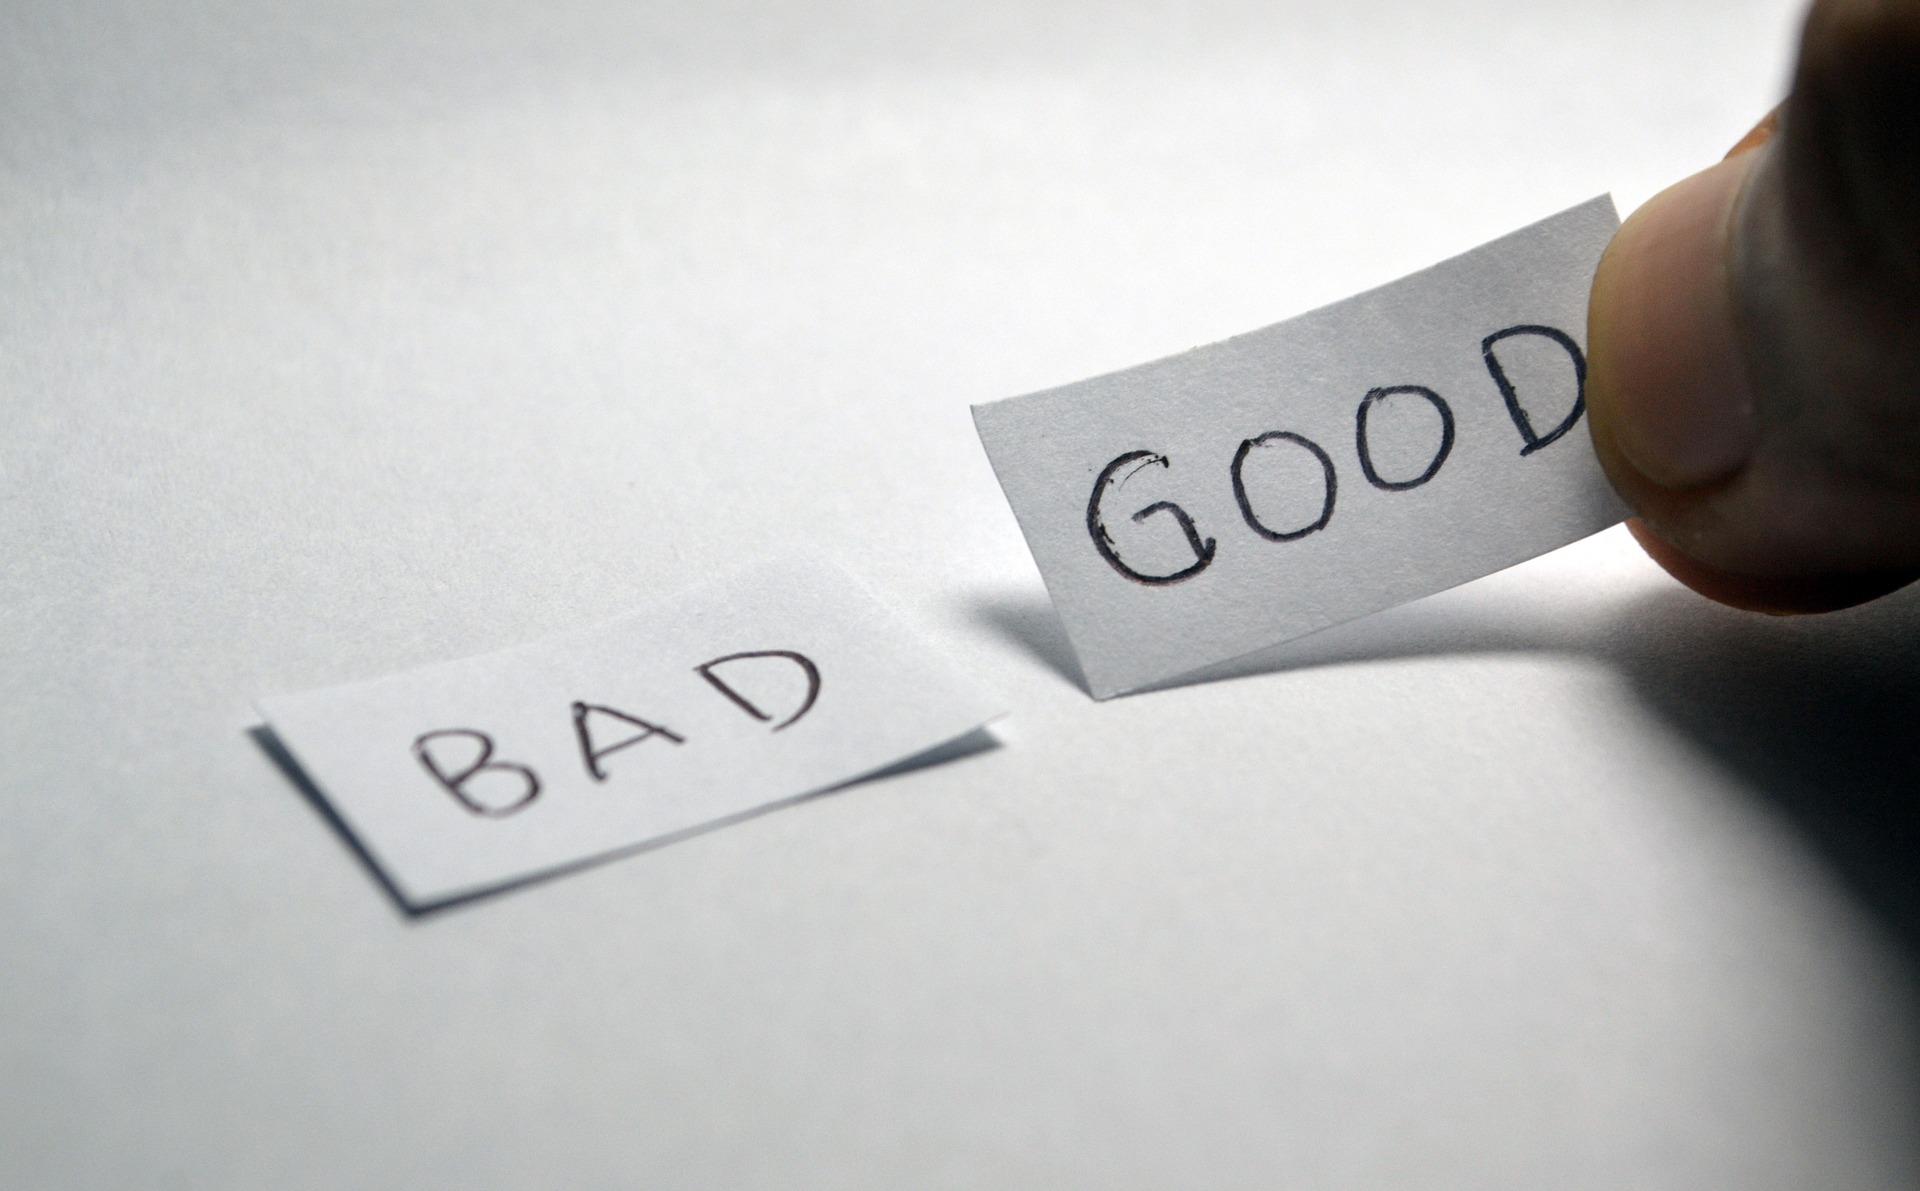 BAD / GOOD